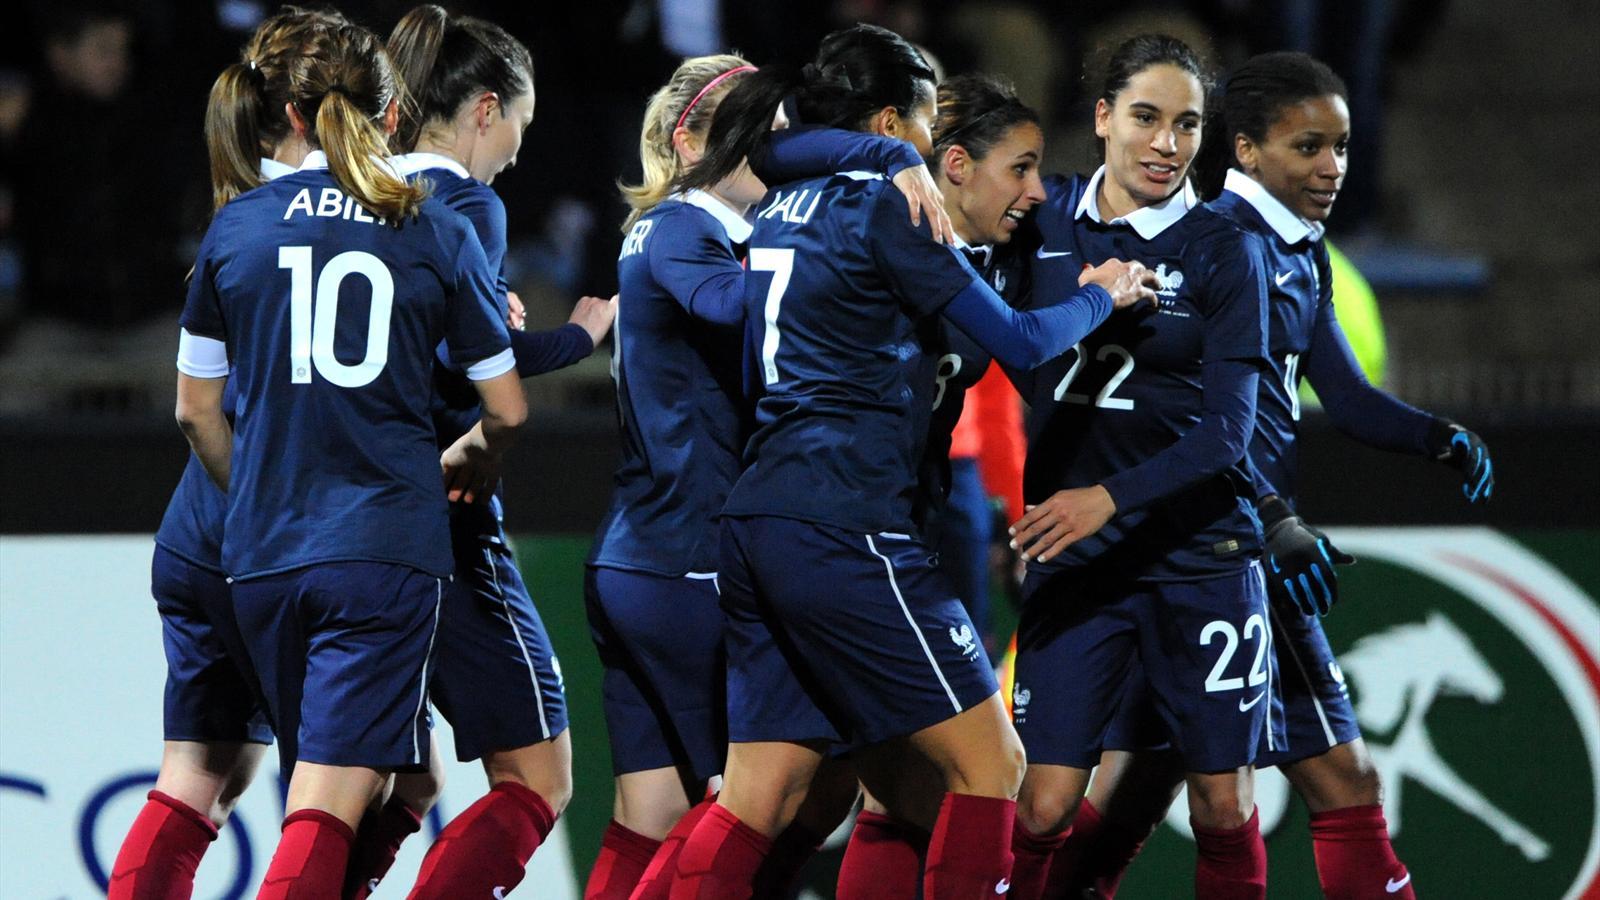 Football féminin: France - Canada en direct live streaming